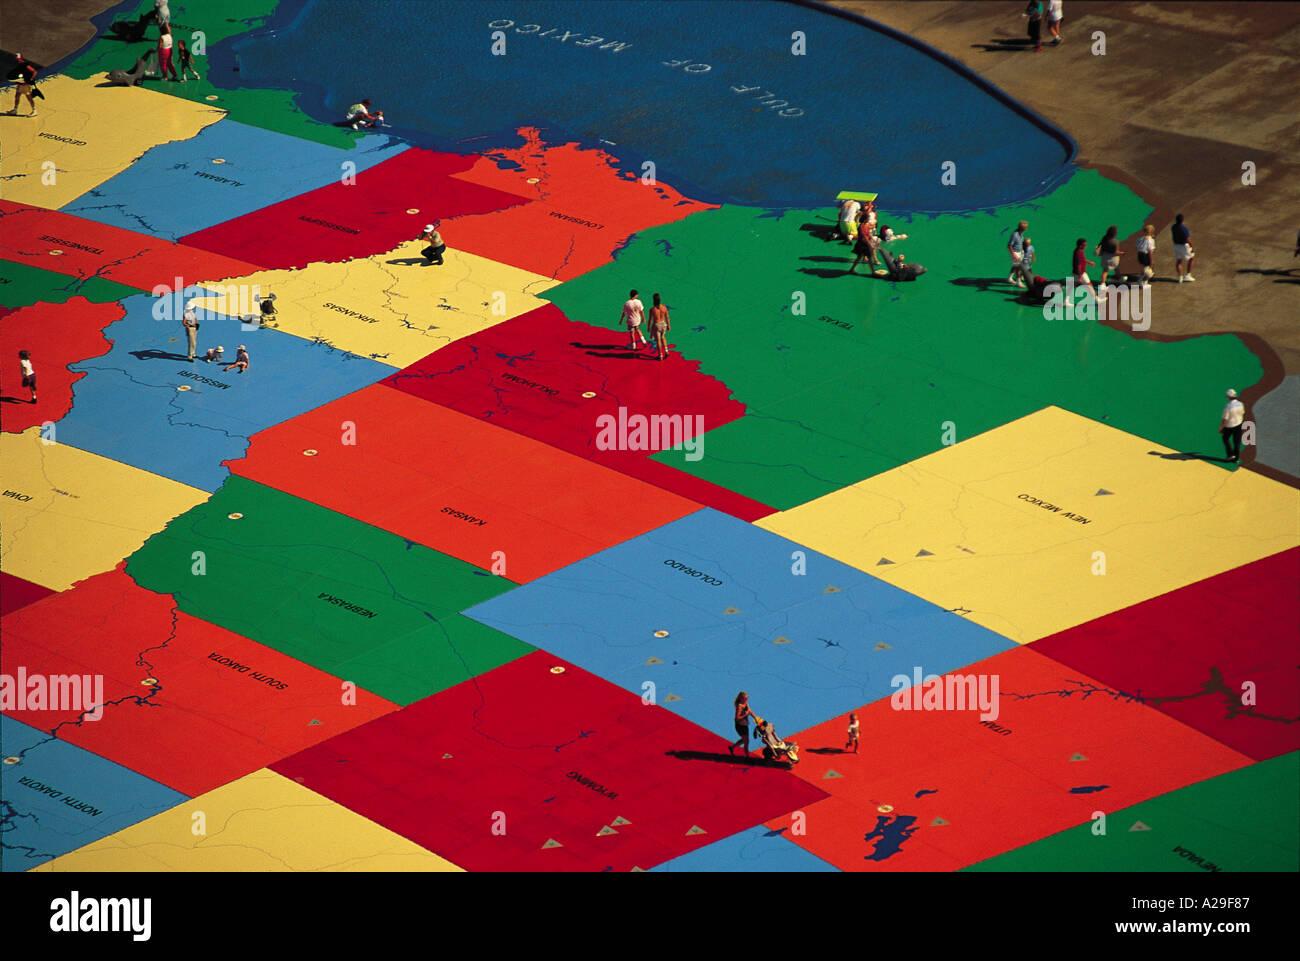 Huge US Map Sea World San Diego California USA S Grandadam Stock - San diego us map